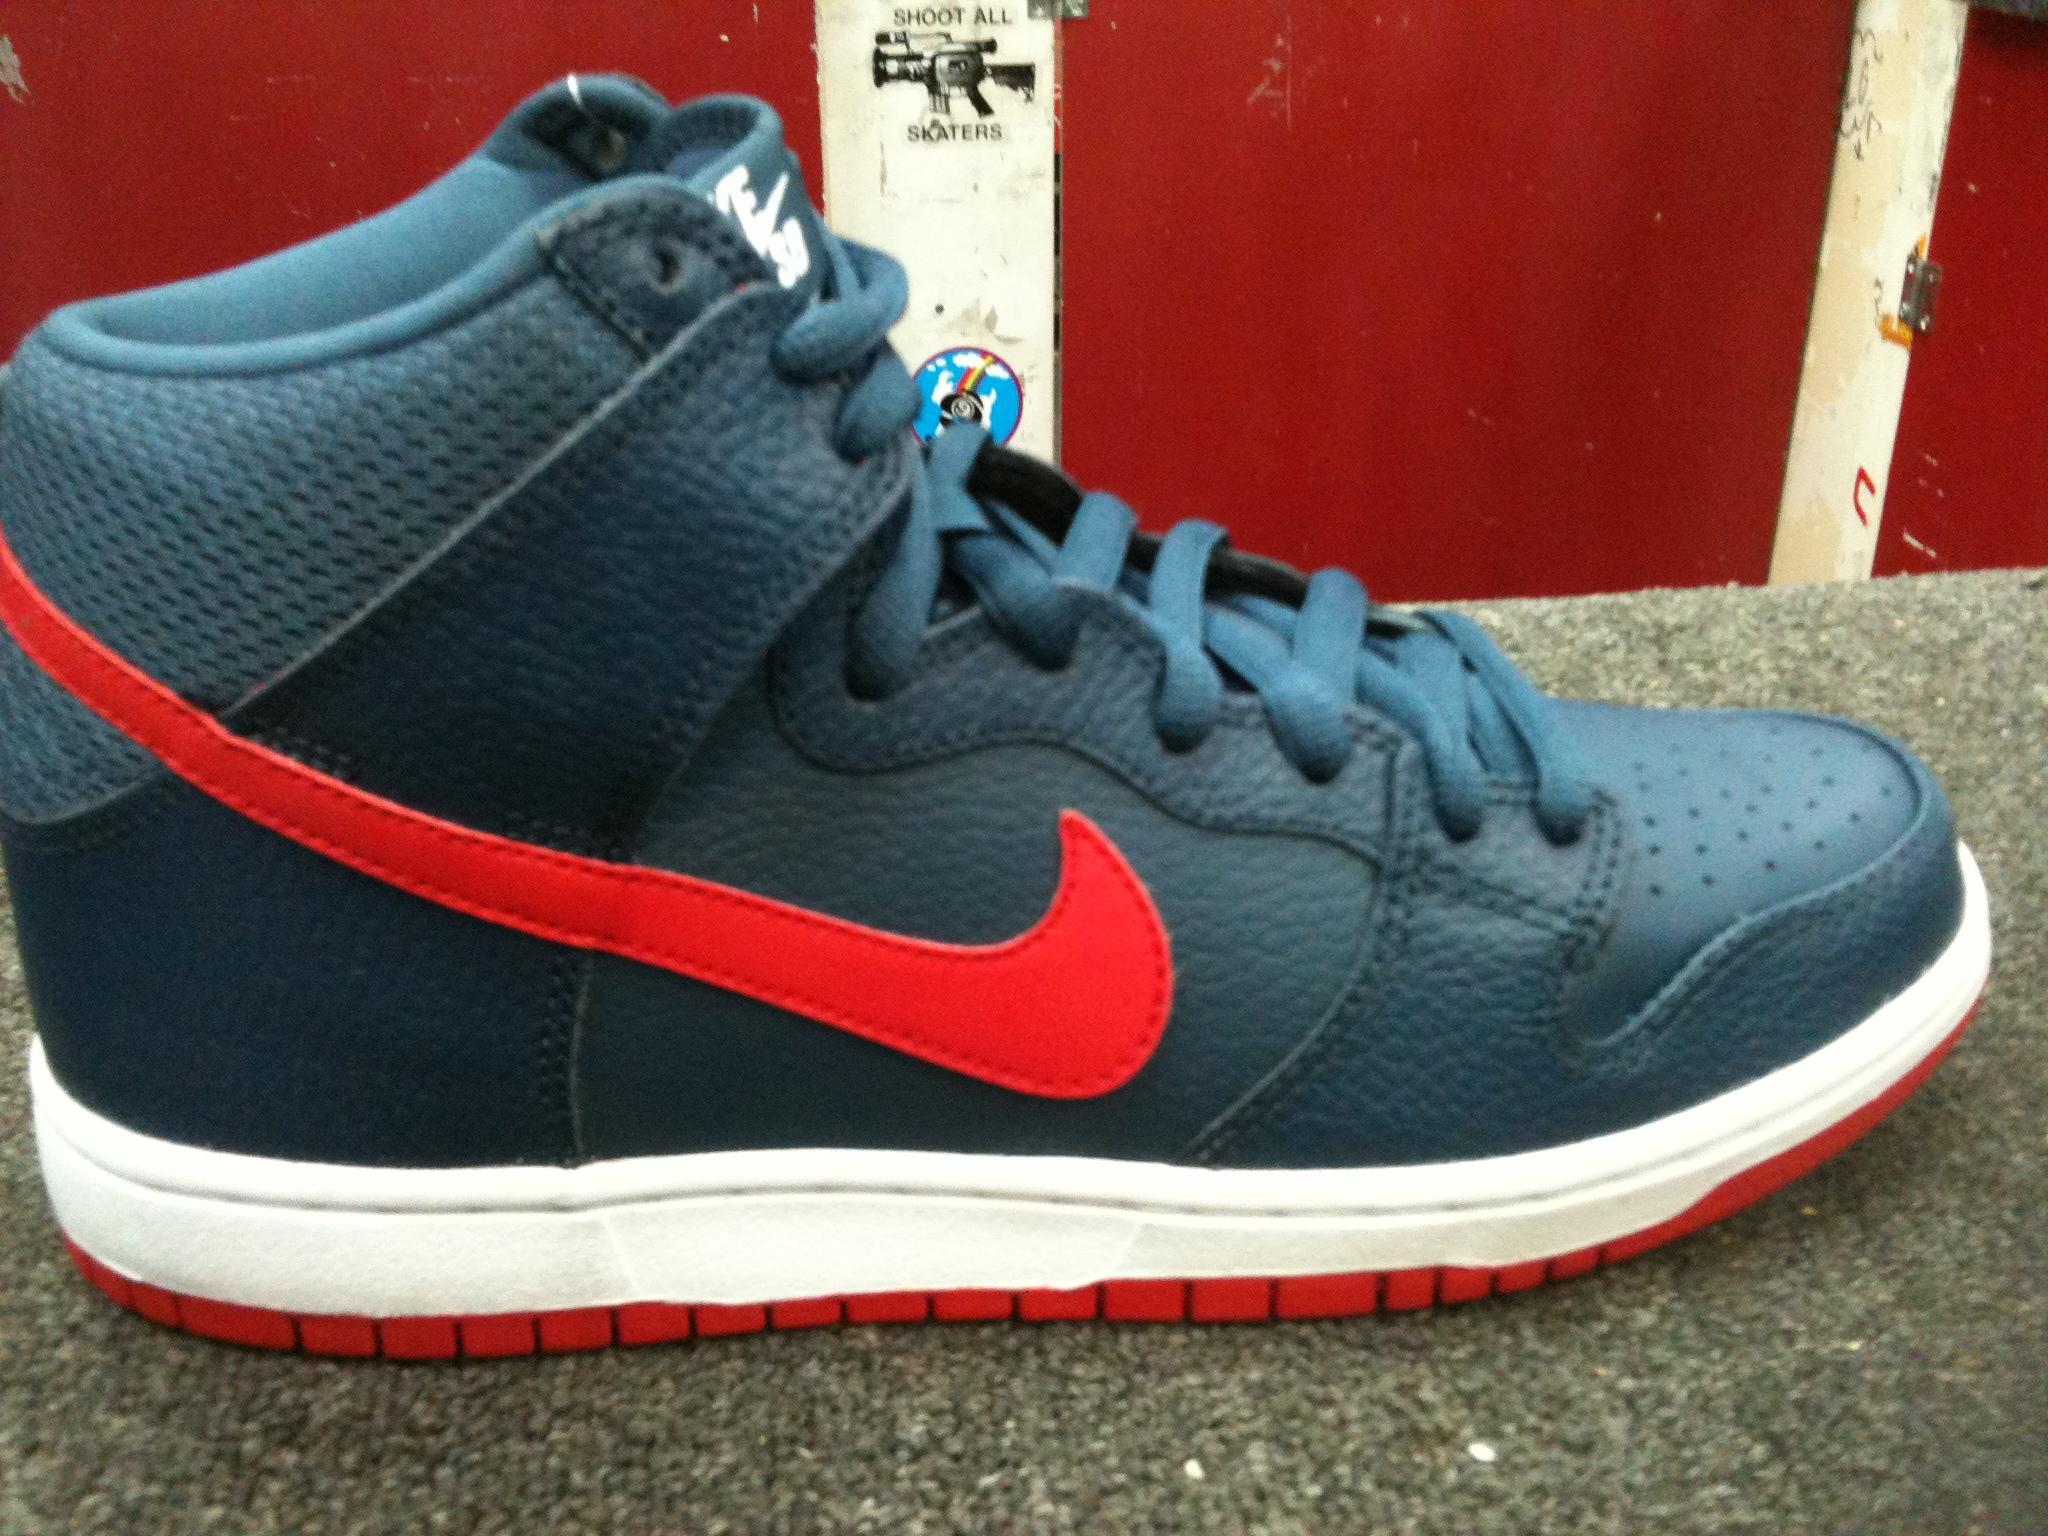 Nike SB Dunk High 'Pebbled' - Spring 2013